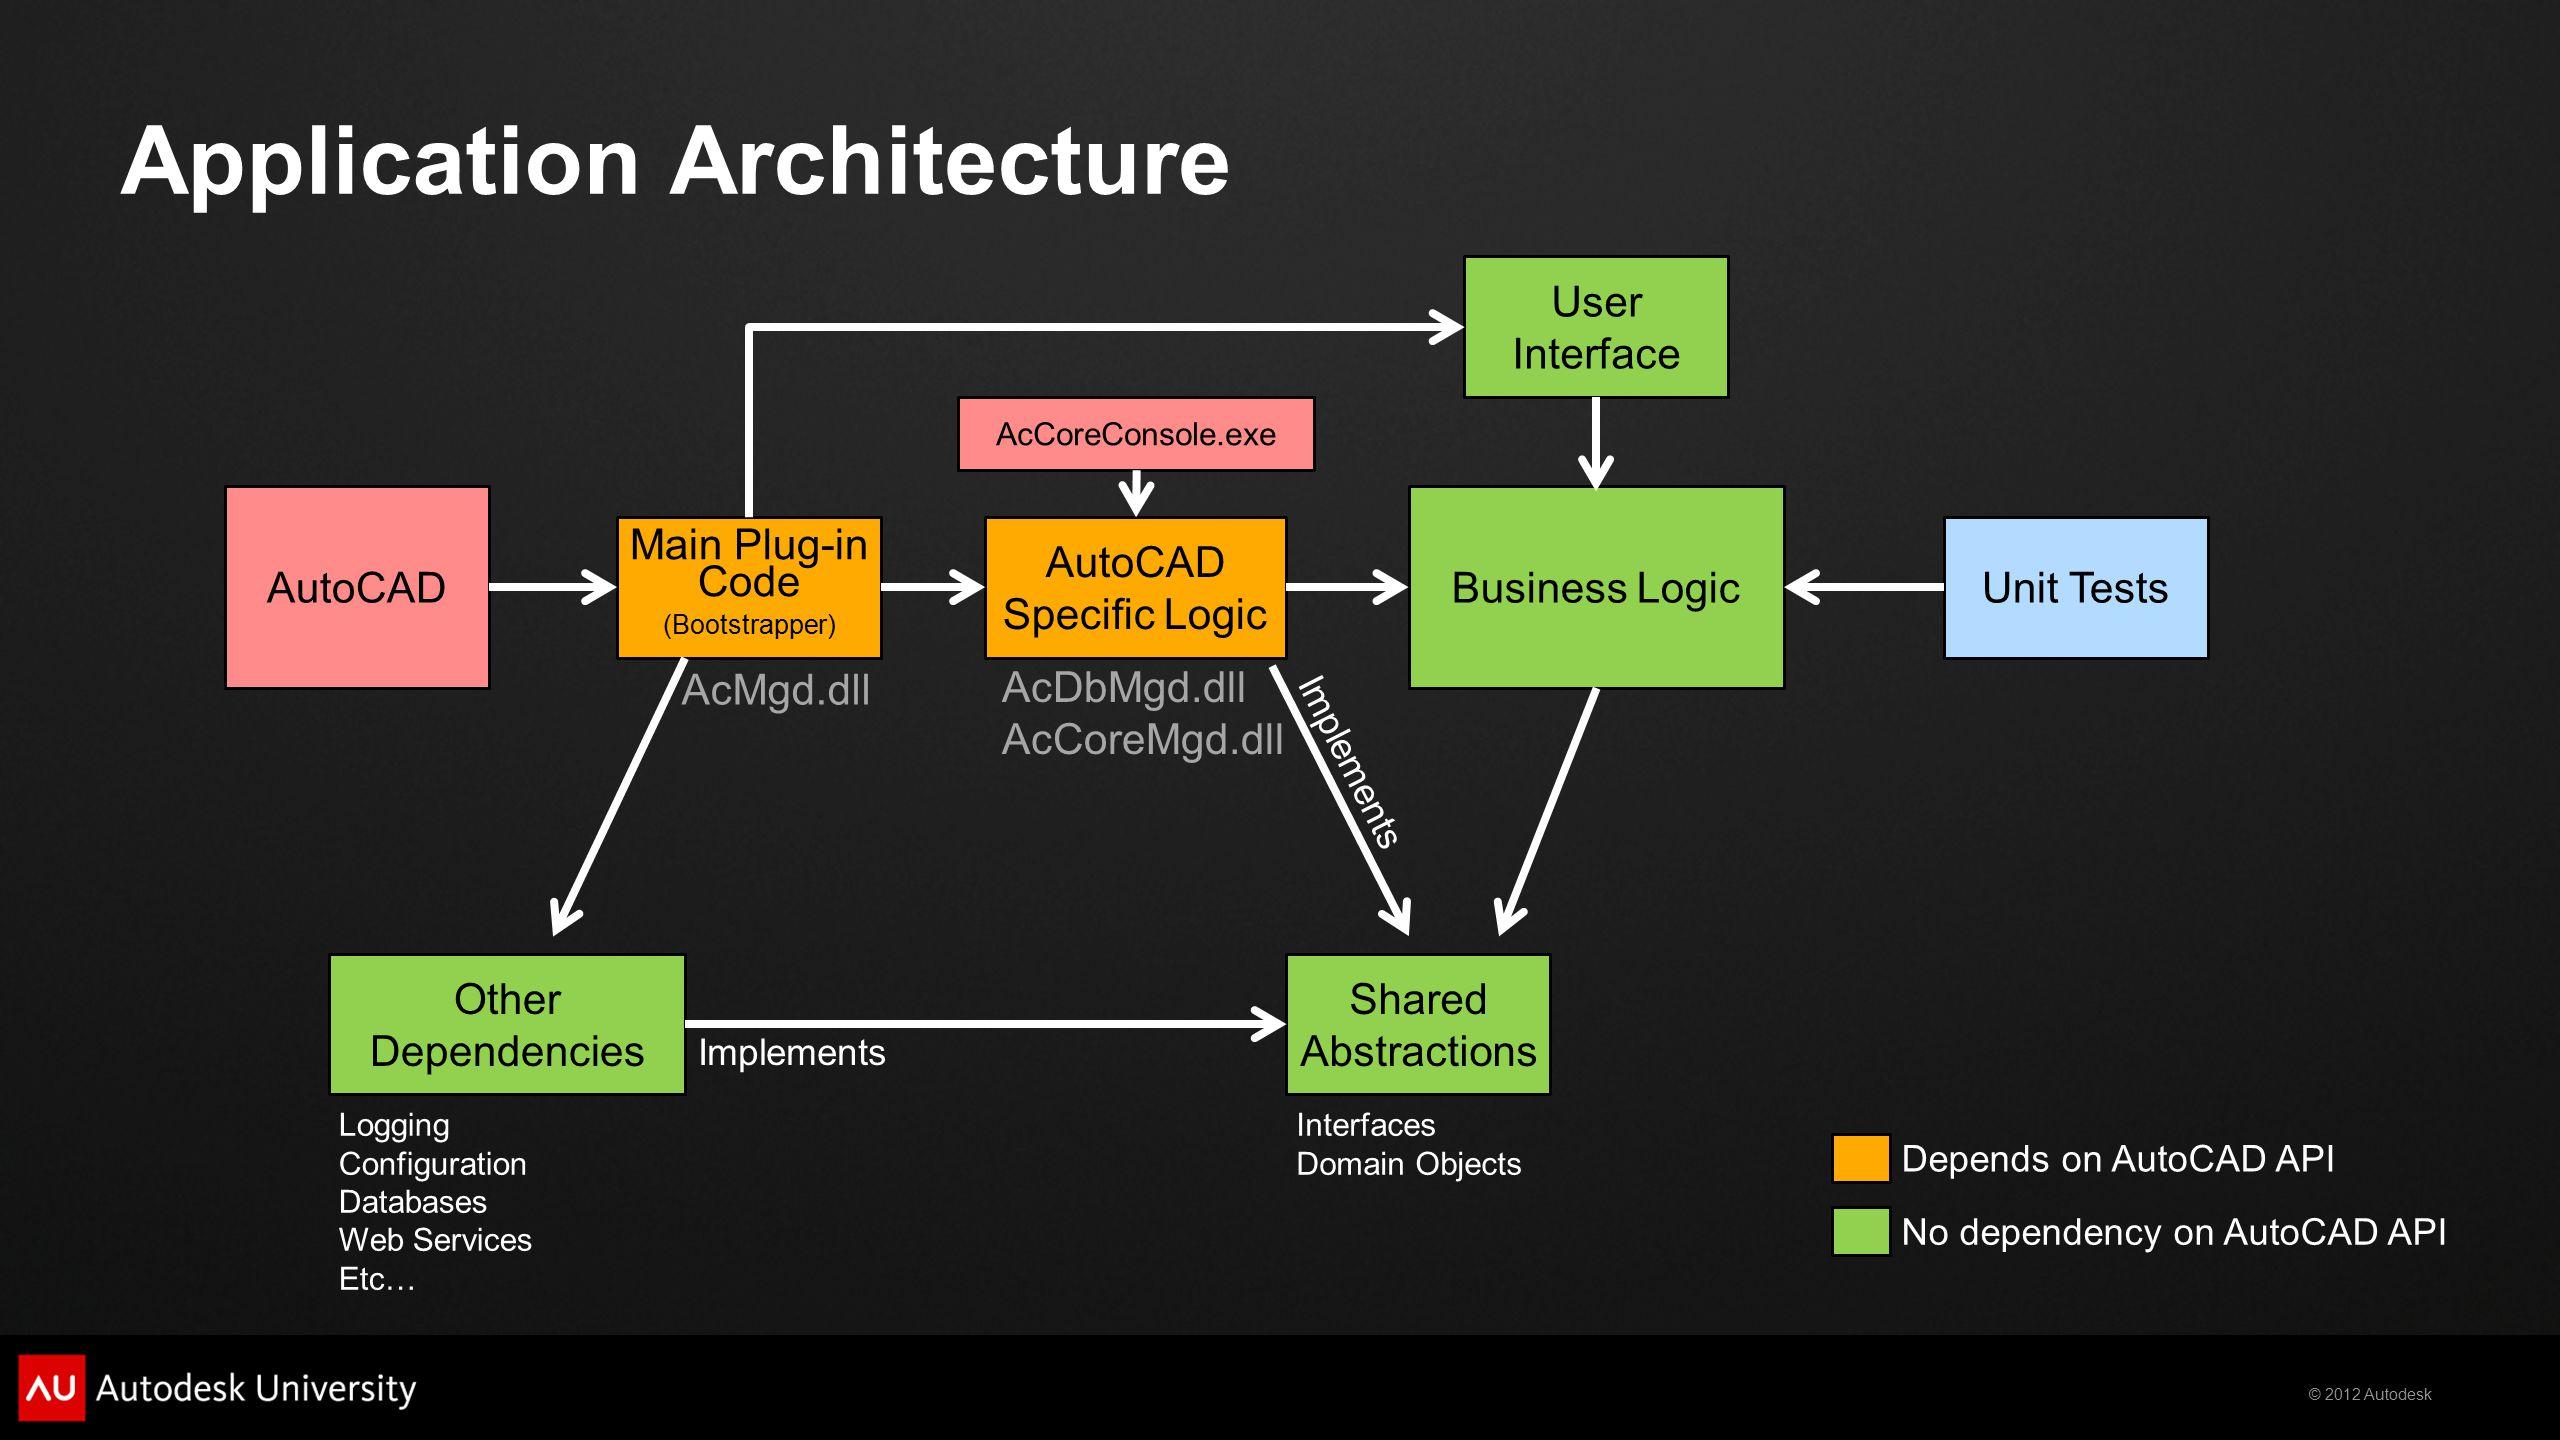 2012 Autodesk Automated Testing with the AutoCAD ® NET API